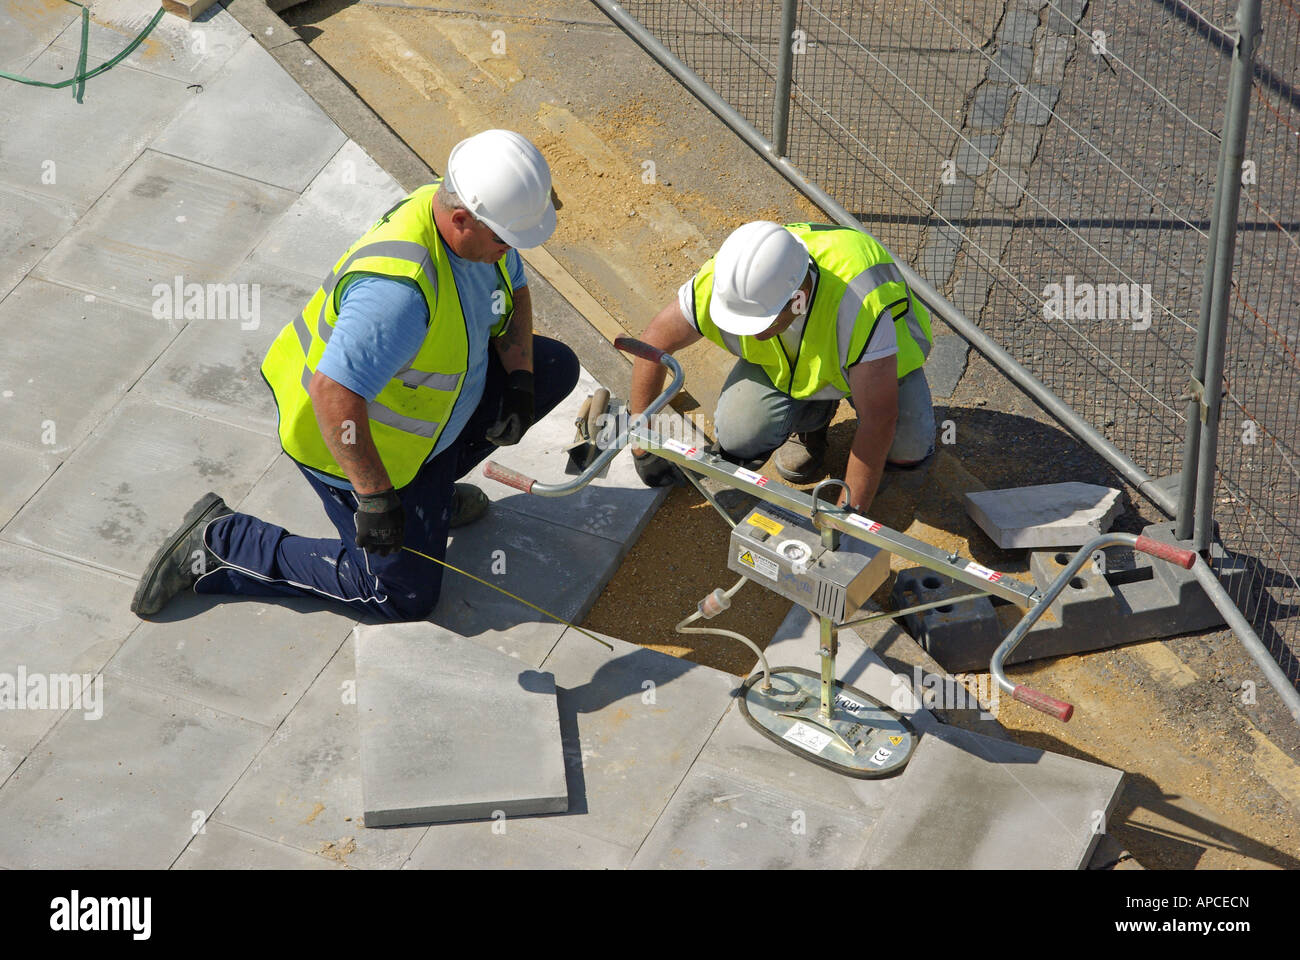 London pavement relaying work in progress two workmen kneeling beside slab lifting tool - Stock Image